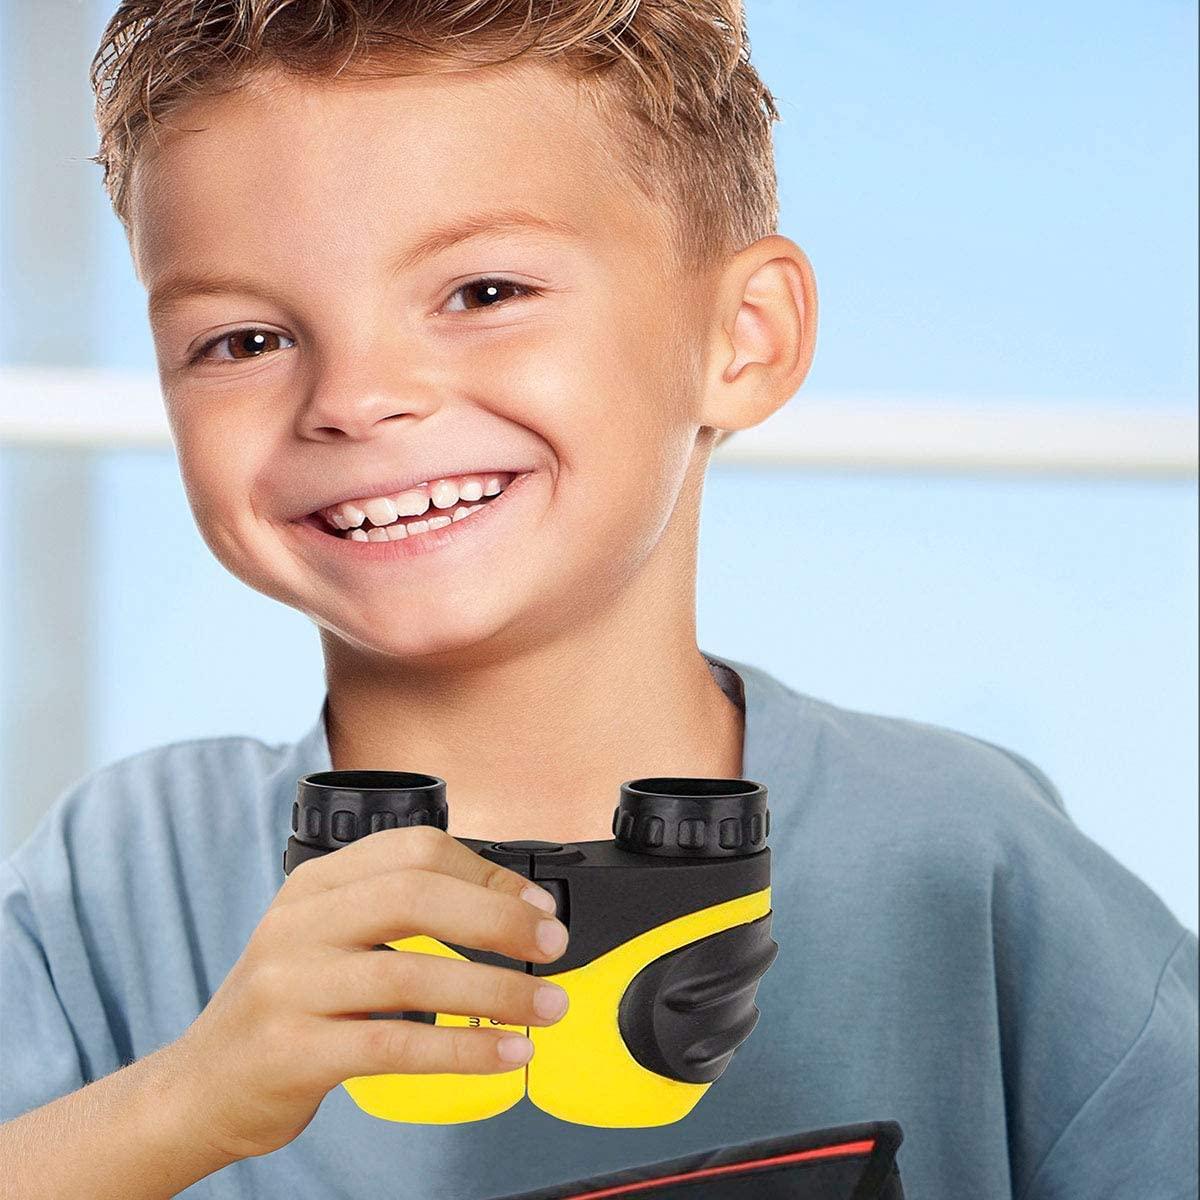 Kids Binoculars for Children